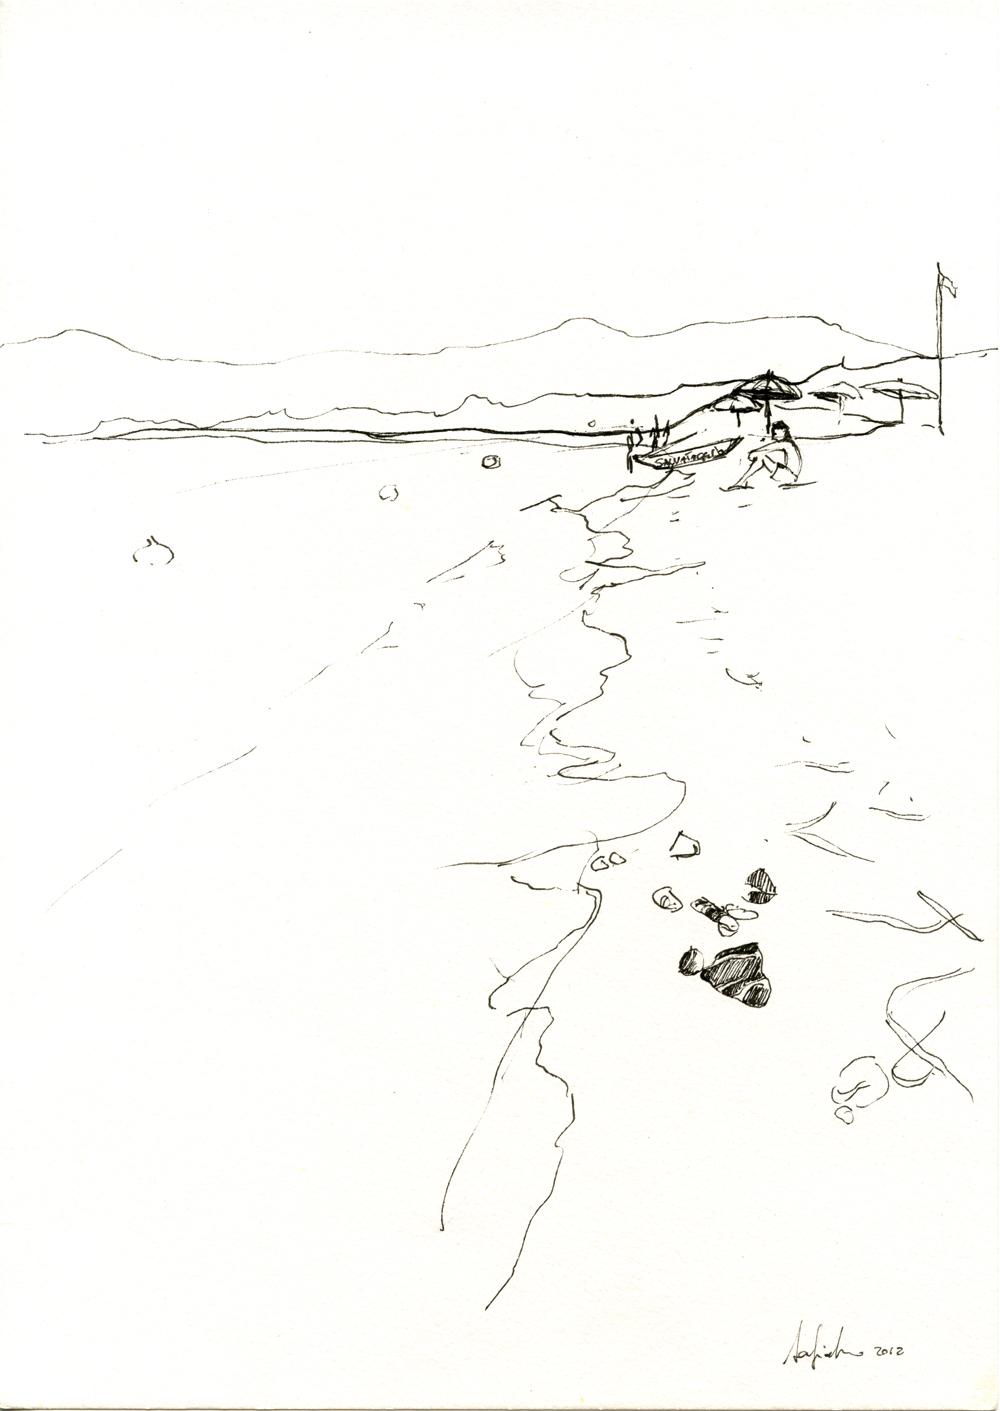 web-salvataggio-sul-gargano-2012